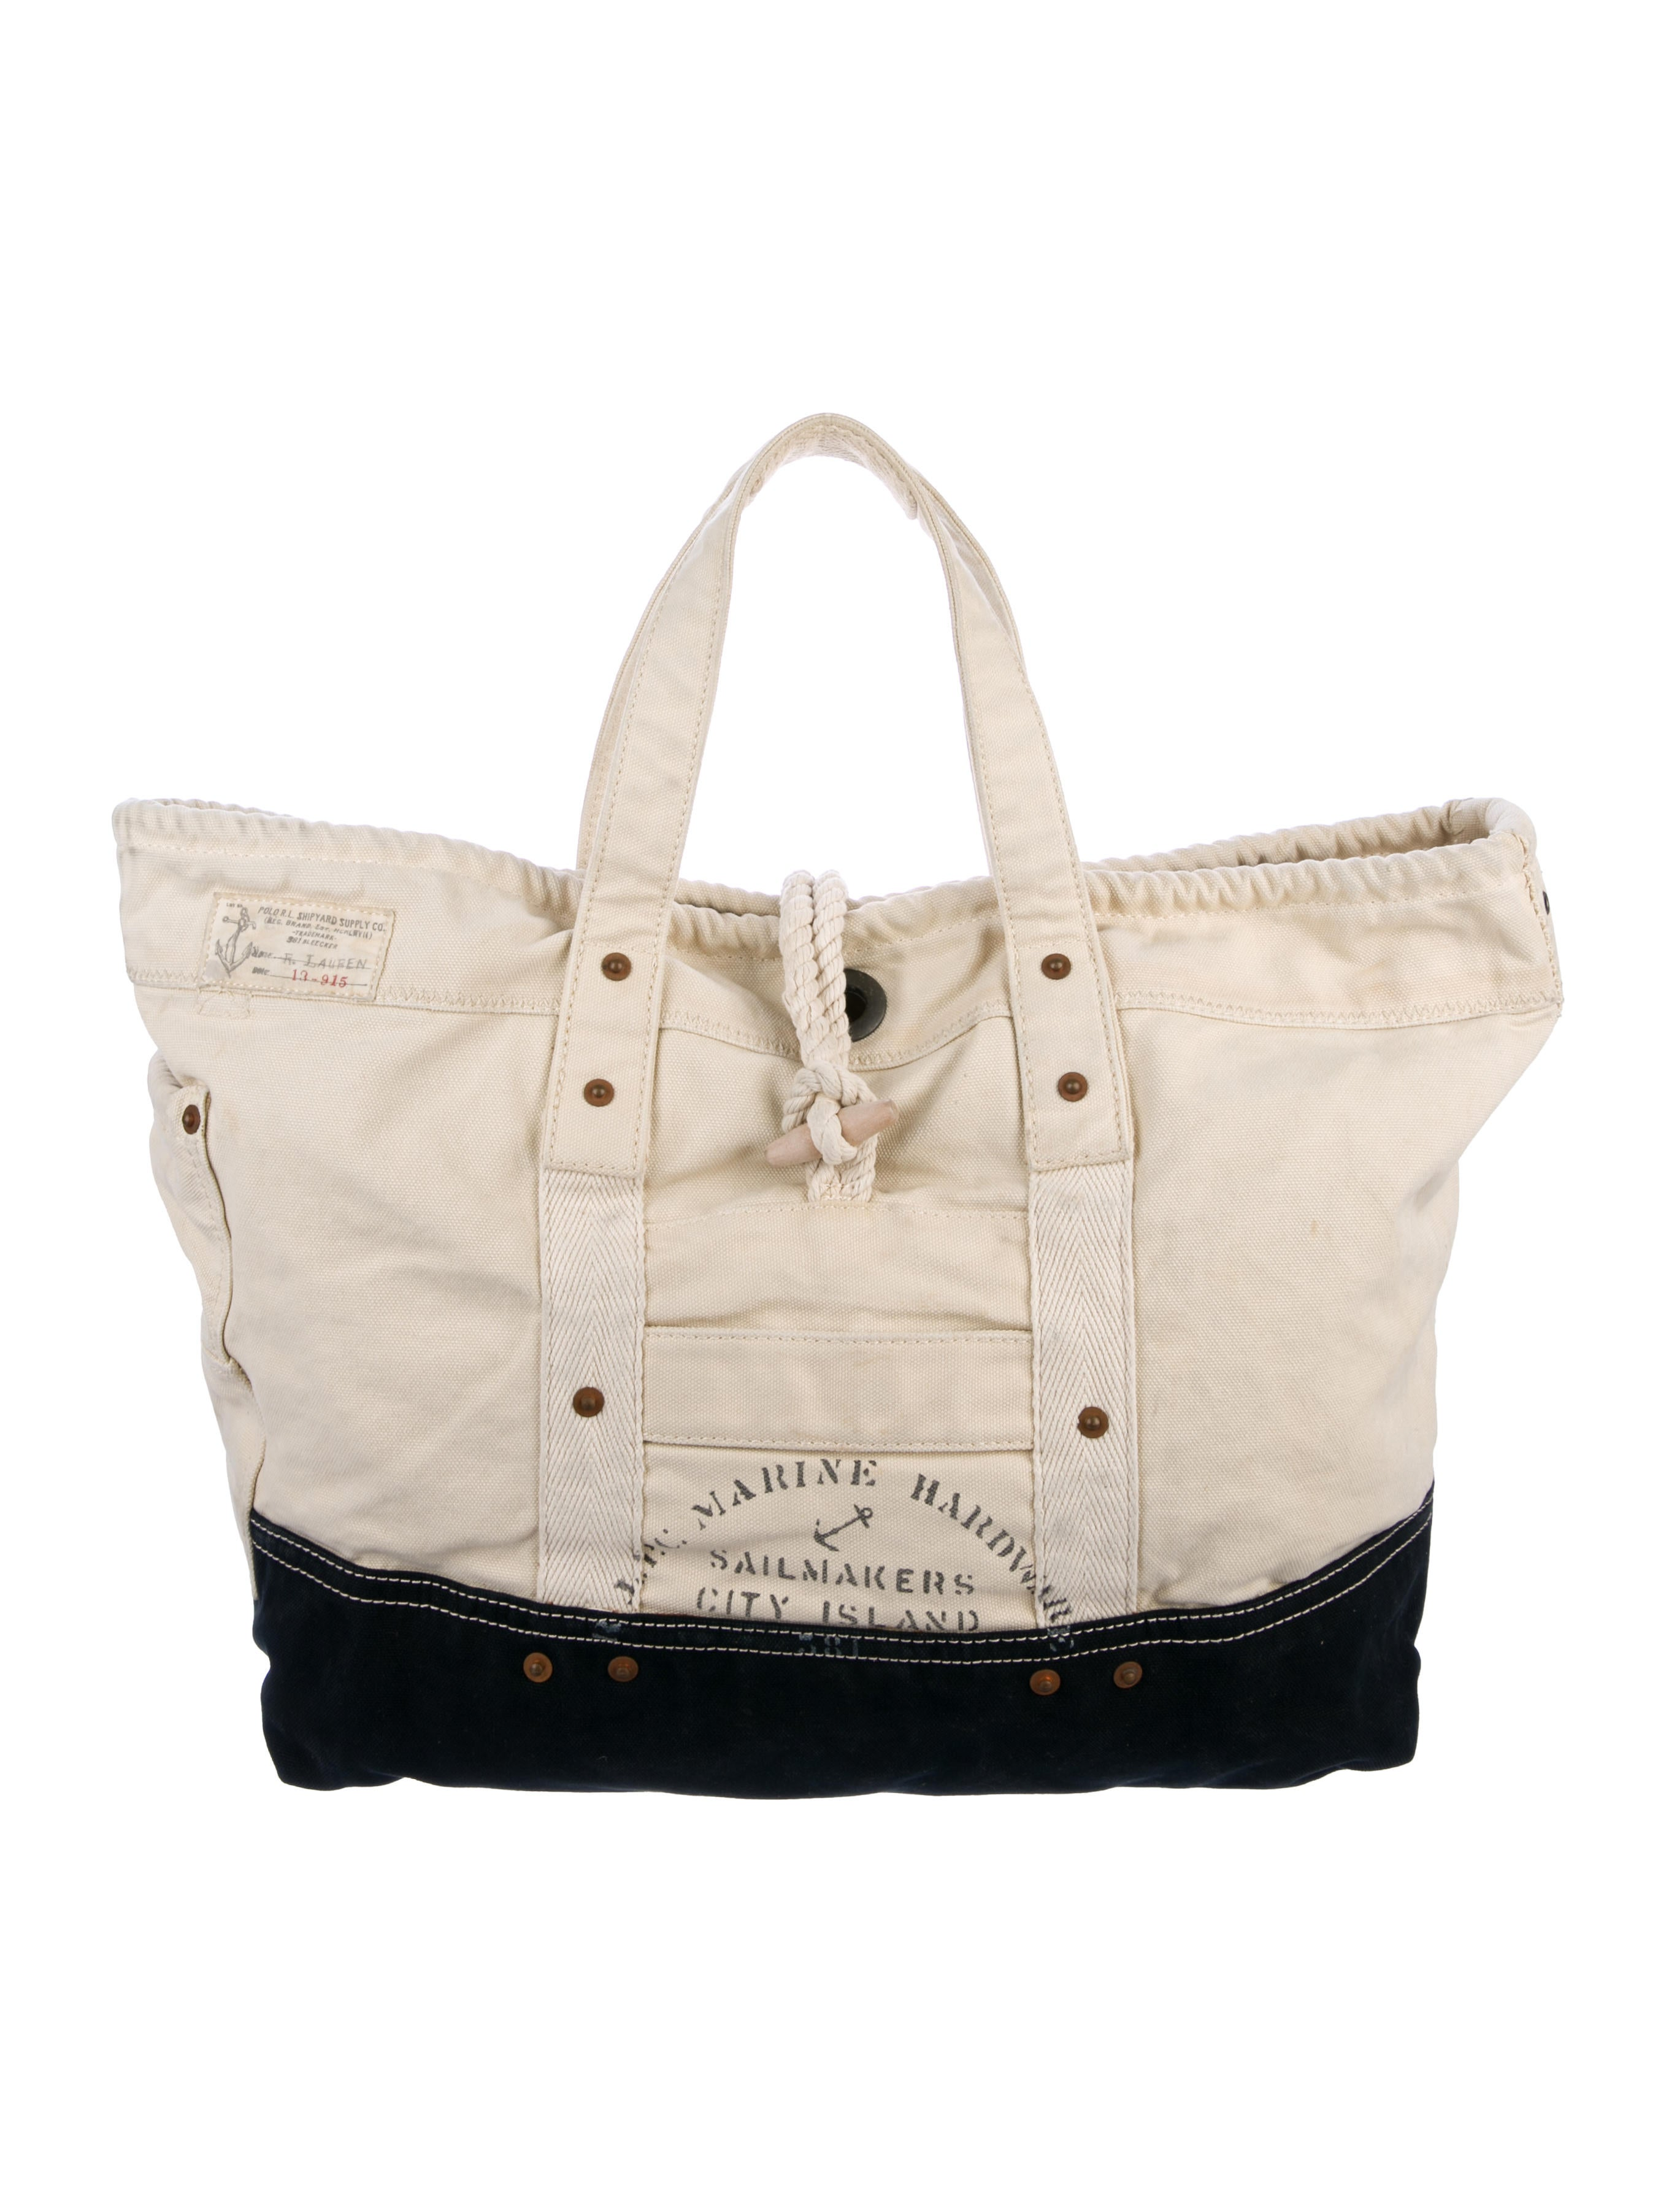 4393b0ad30 ... new zealand women handbags ralph lauren canvas tote. canvas tote 34dbb  99452